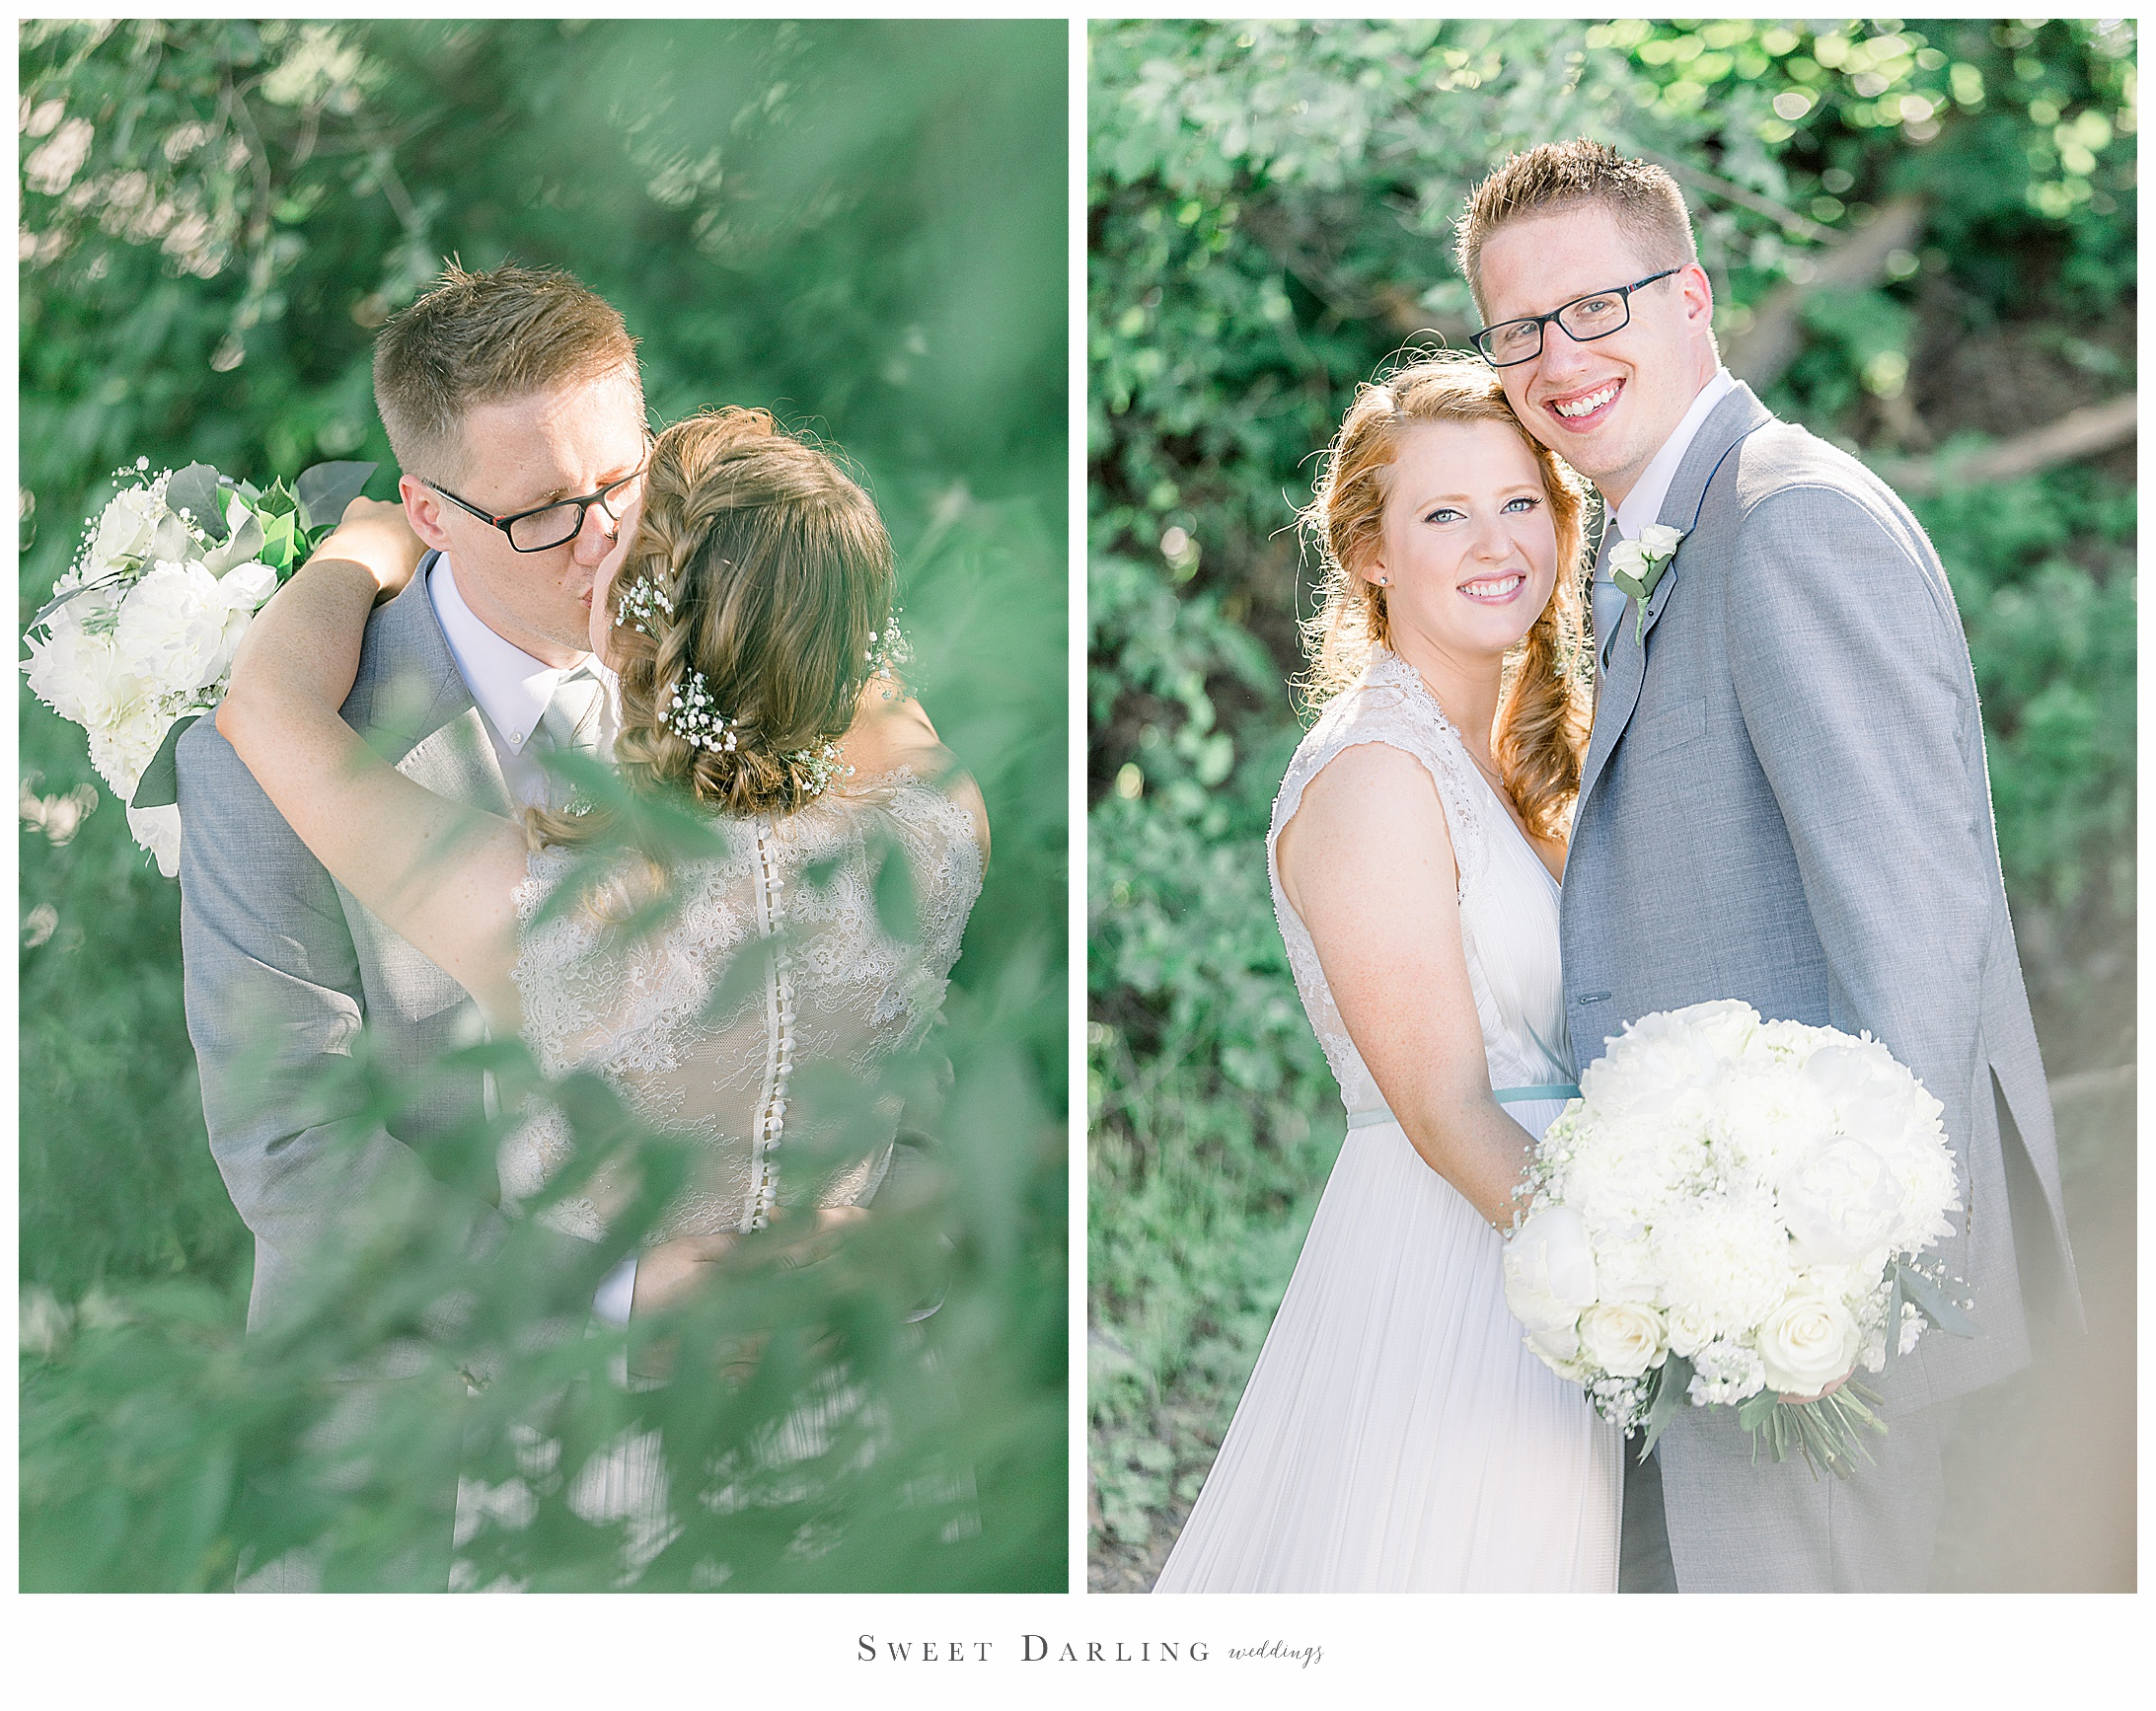 champaign-illinois-boho-summer-wedding-photographer-city-center-sweet-darling-weddings_2336.jpg